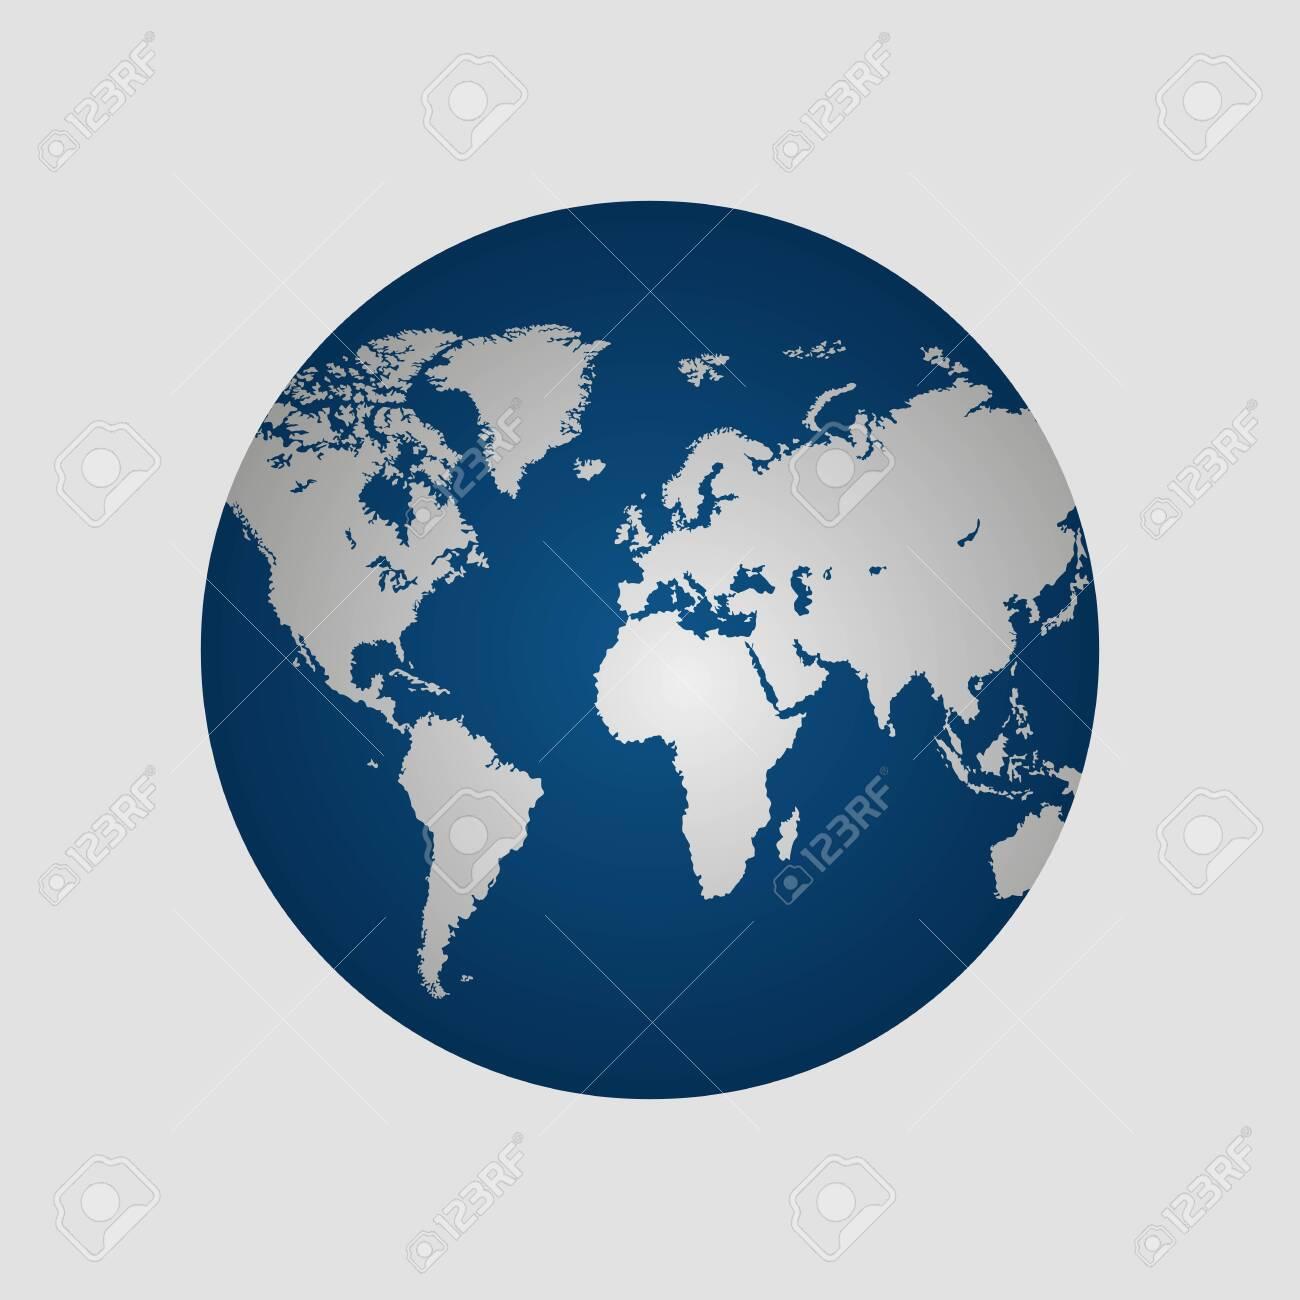 Earth globe vector illustration isolated - 143712649